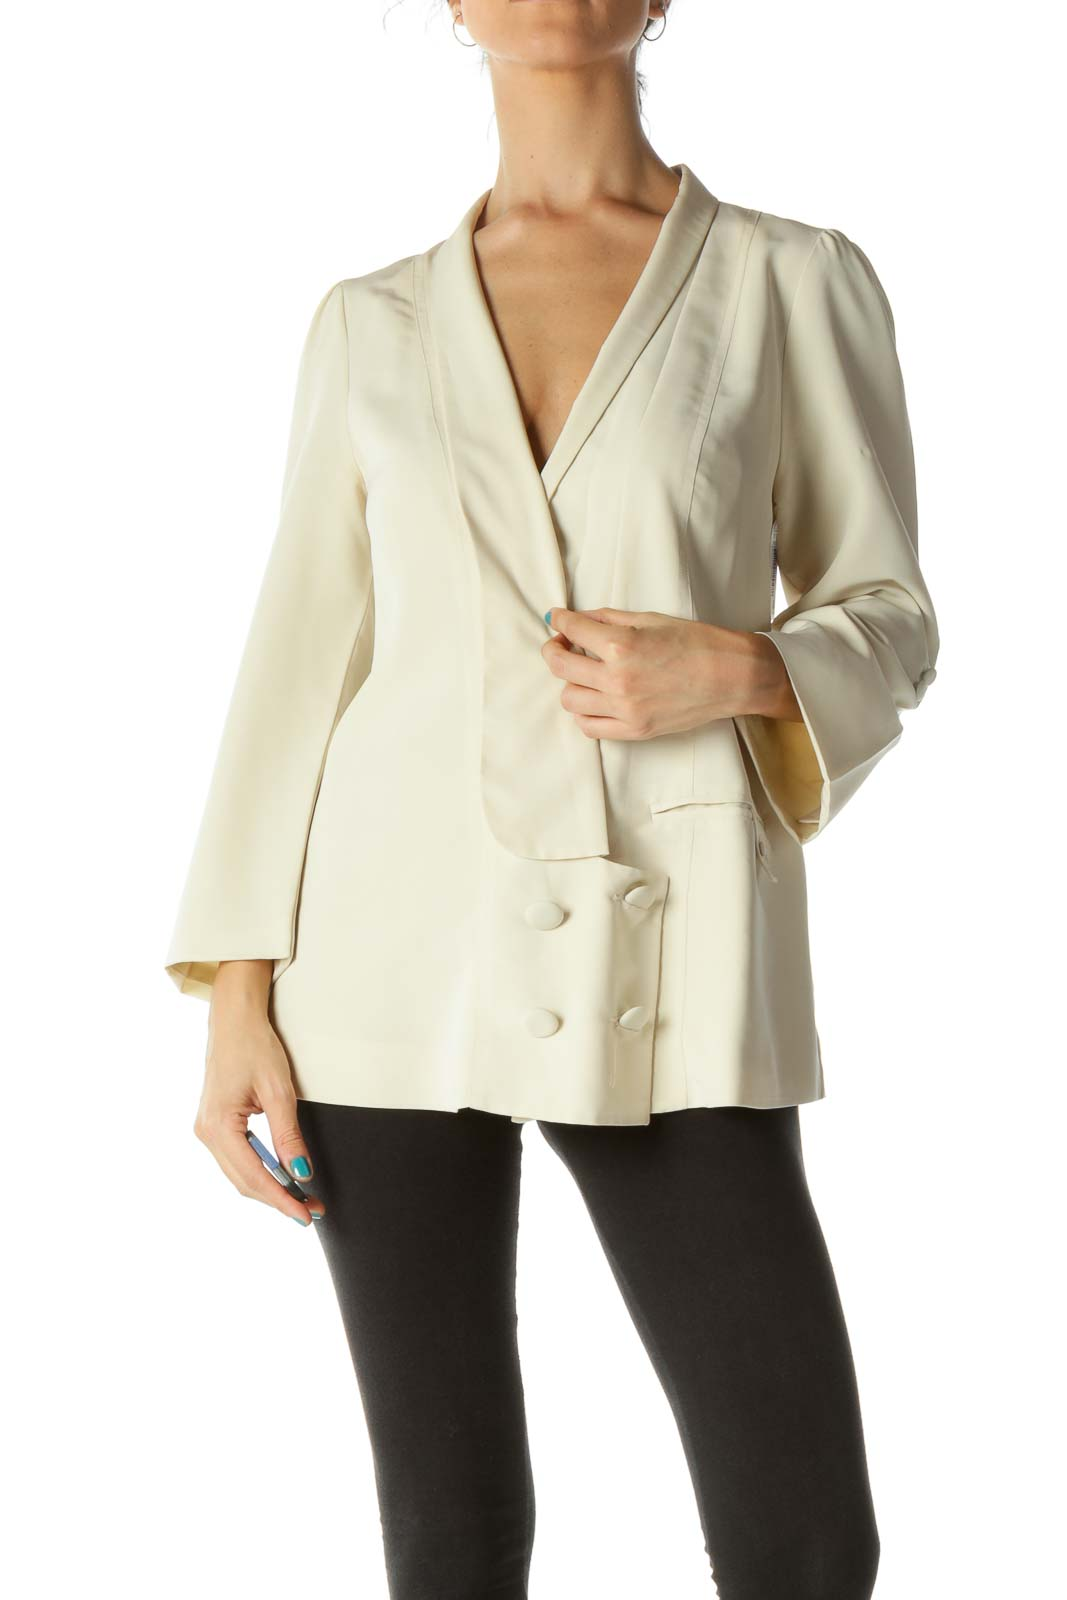 Cream Buttoned Suit Top